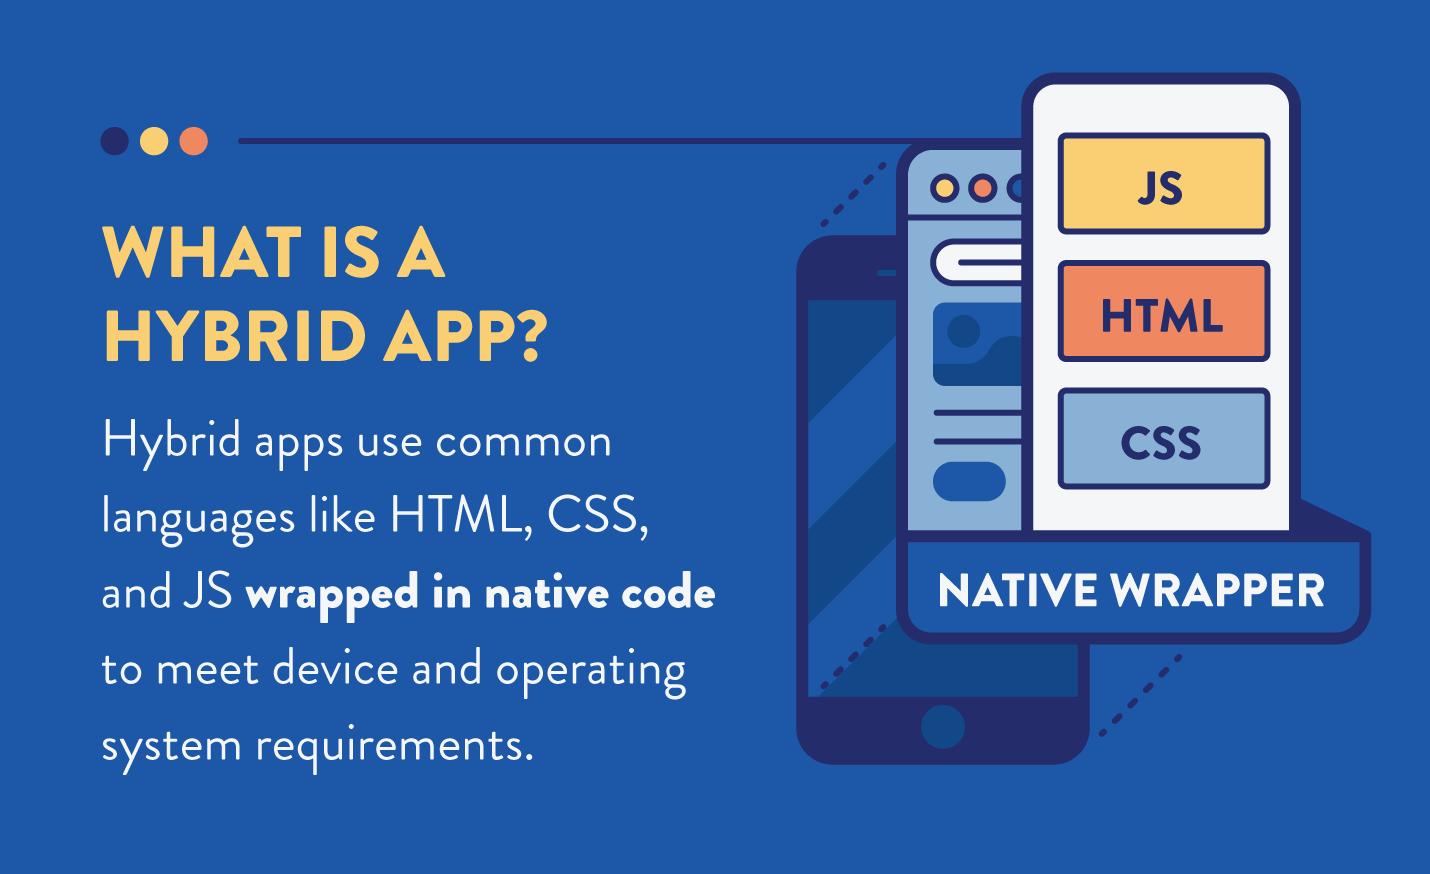 definition of a hybrid app